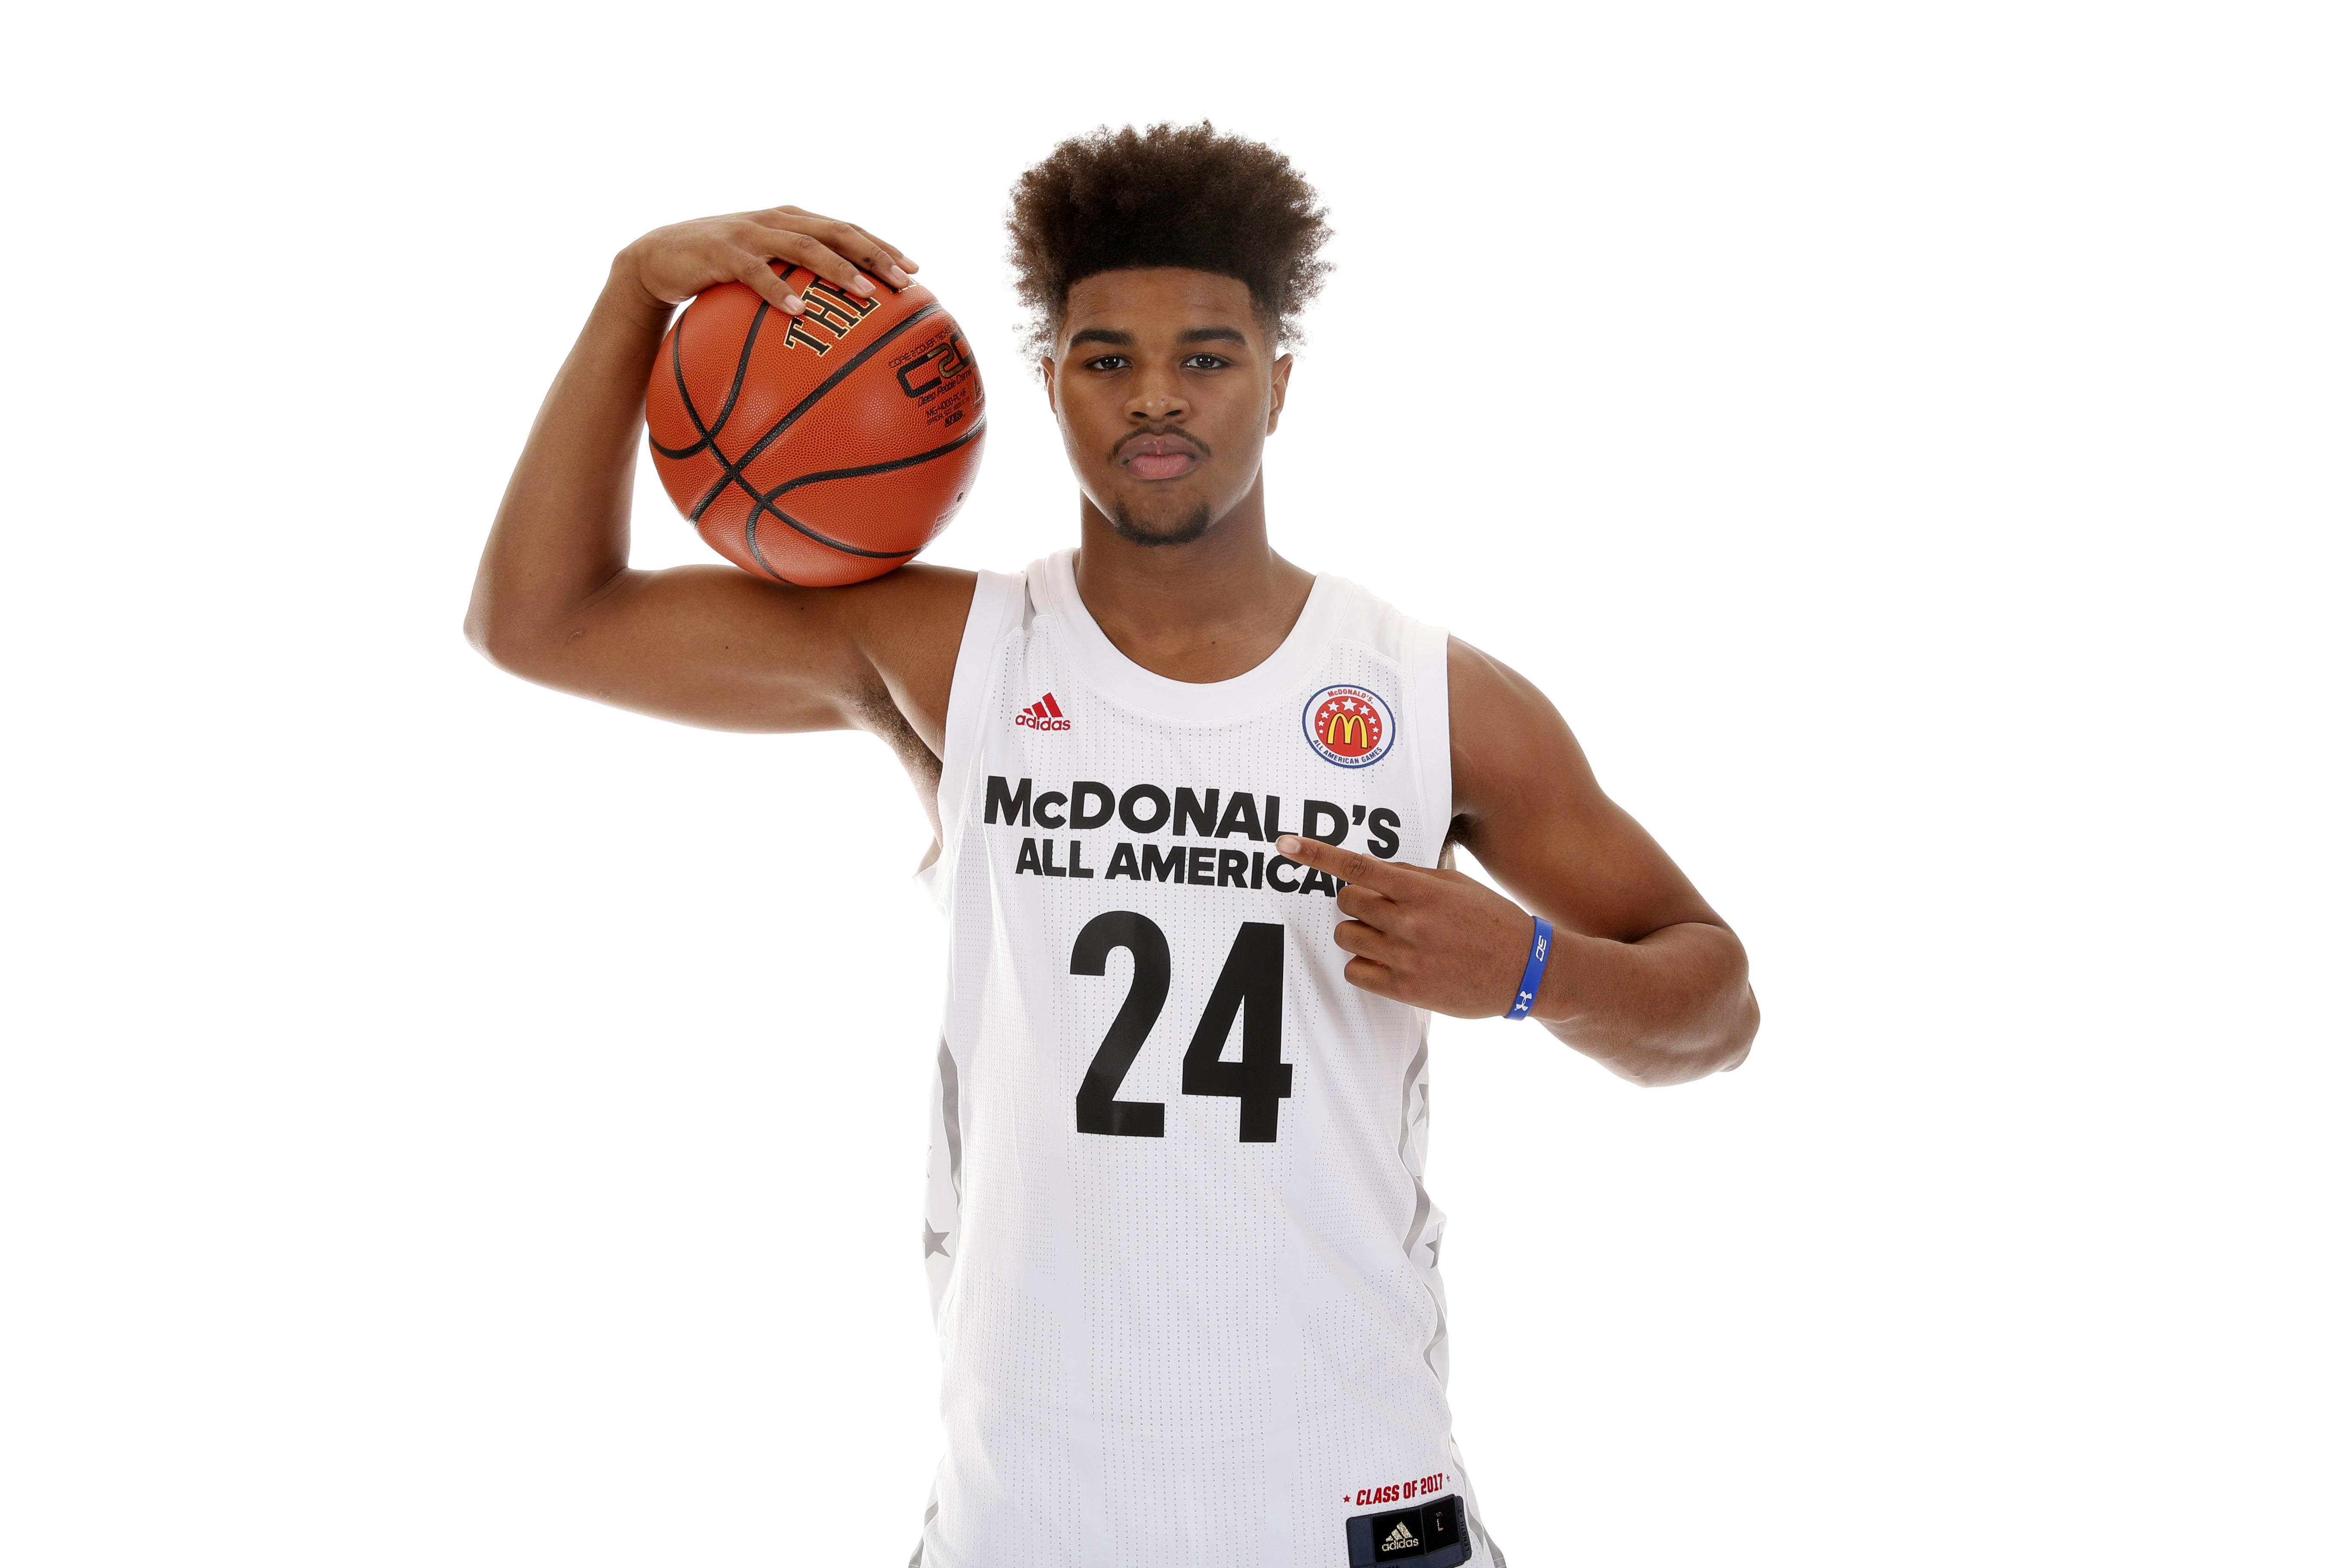 9975049-high-school-basketball-mcdonalds-all-american-portraits-1